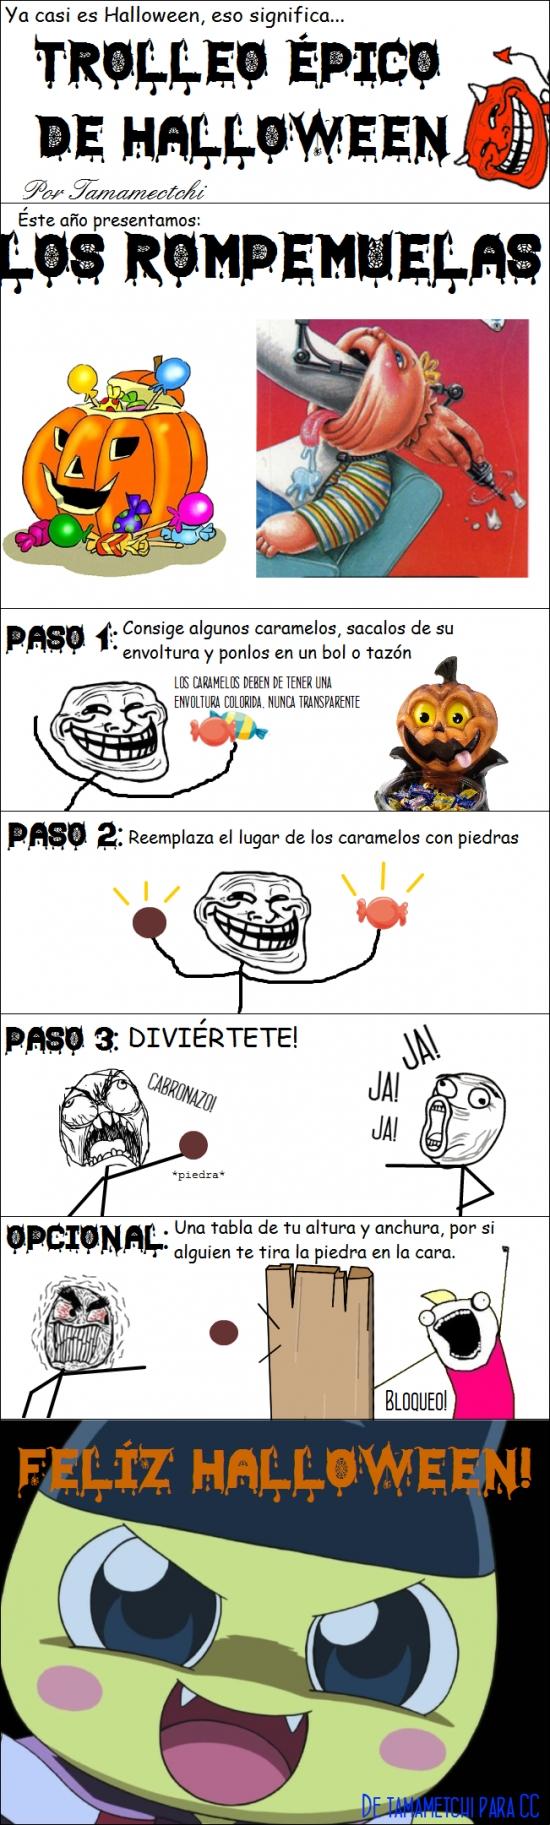 Trollface - Trolleo de Halloween ¿Te atreves?